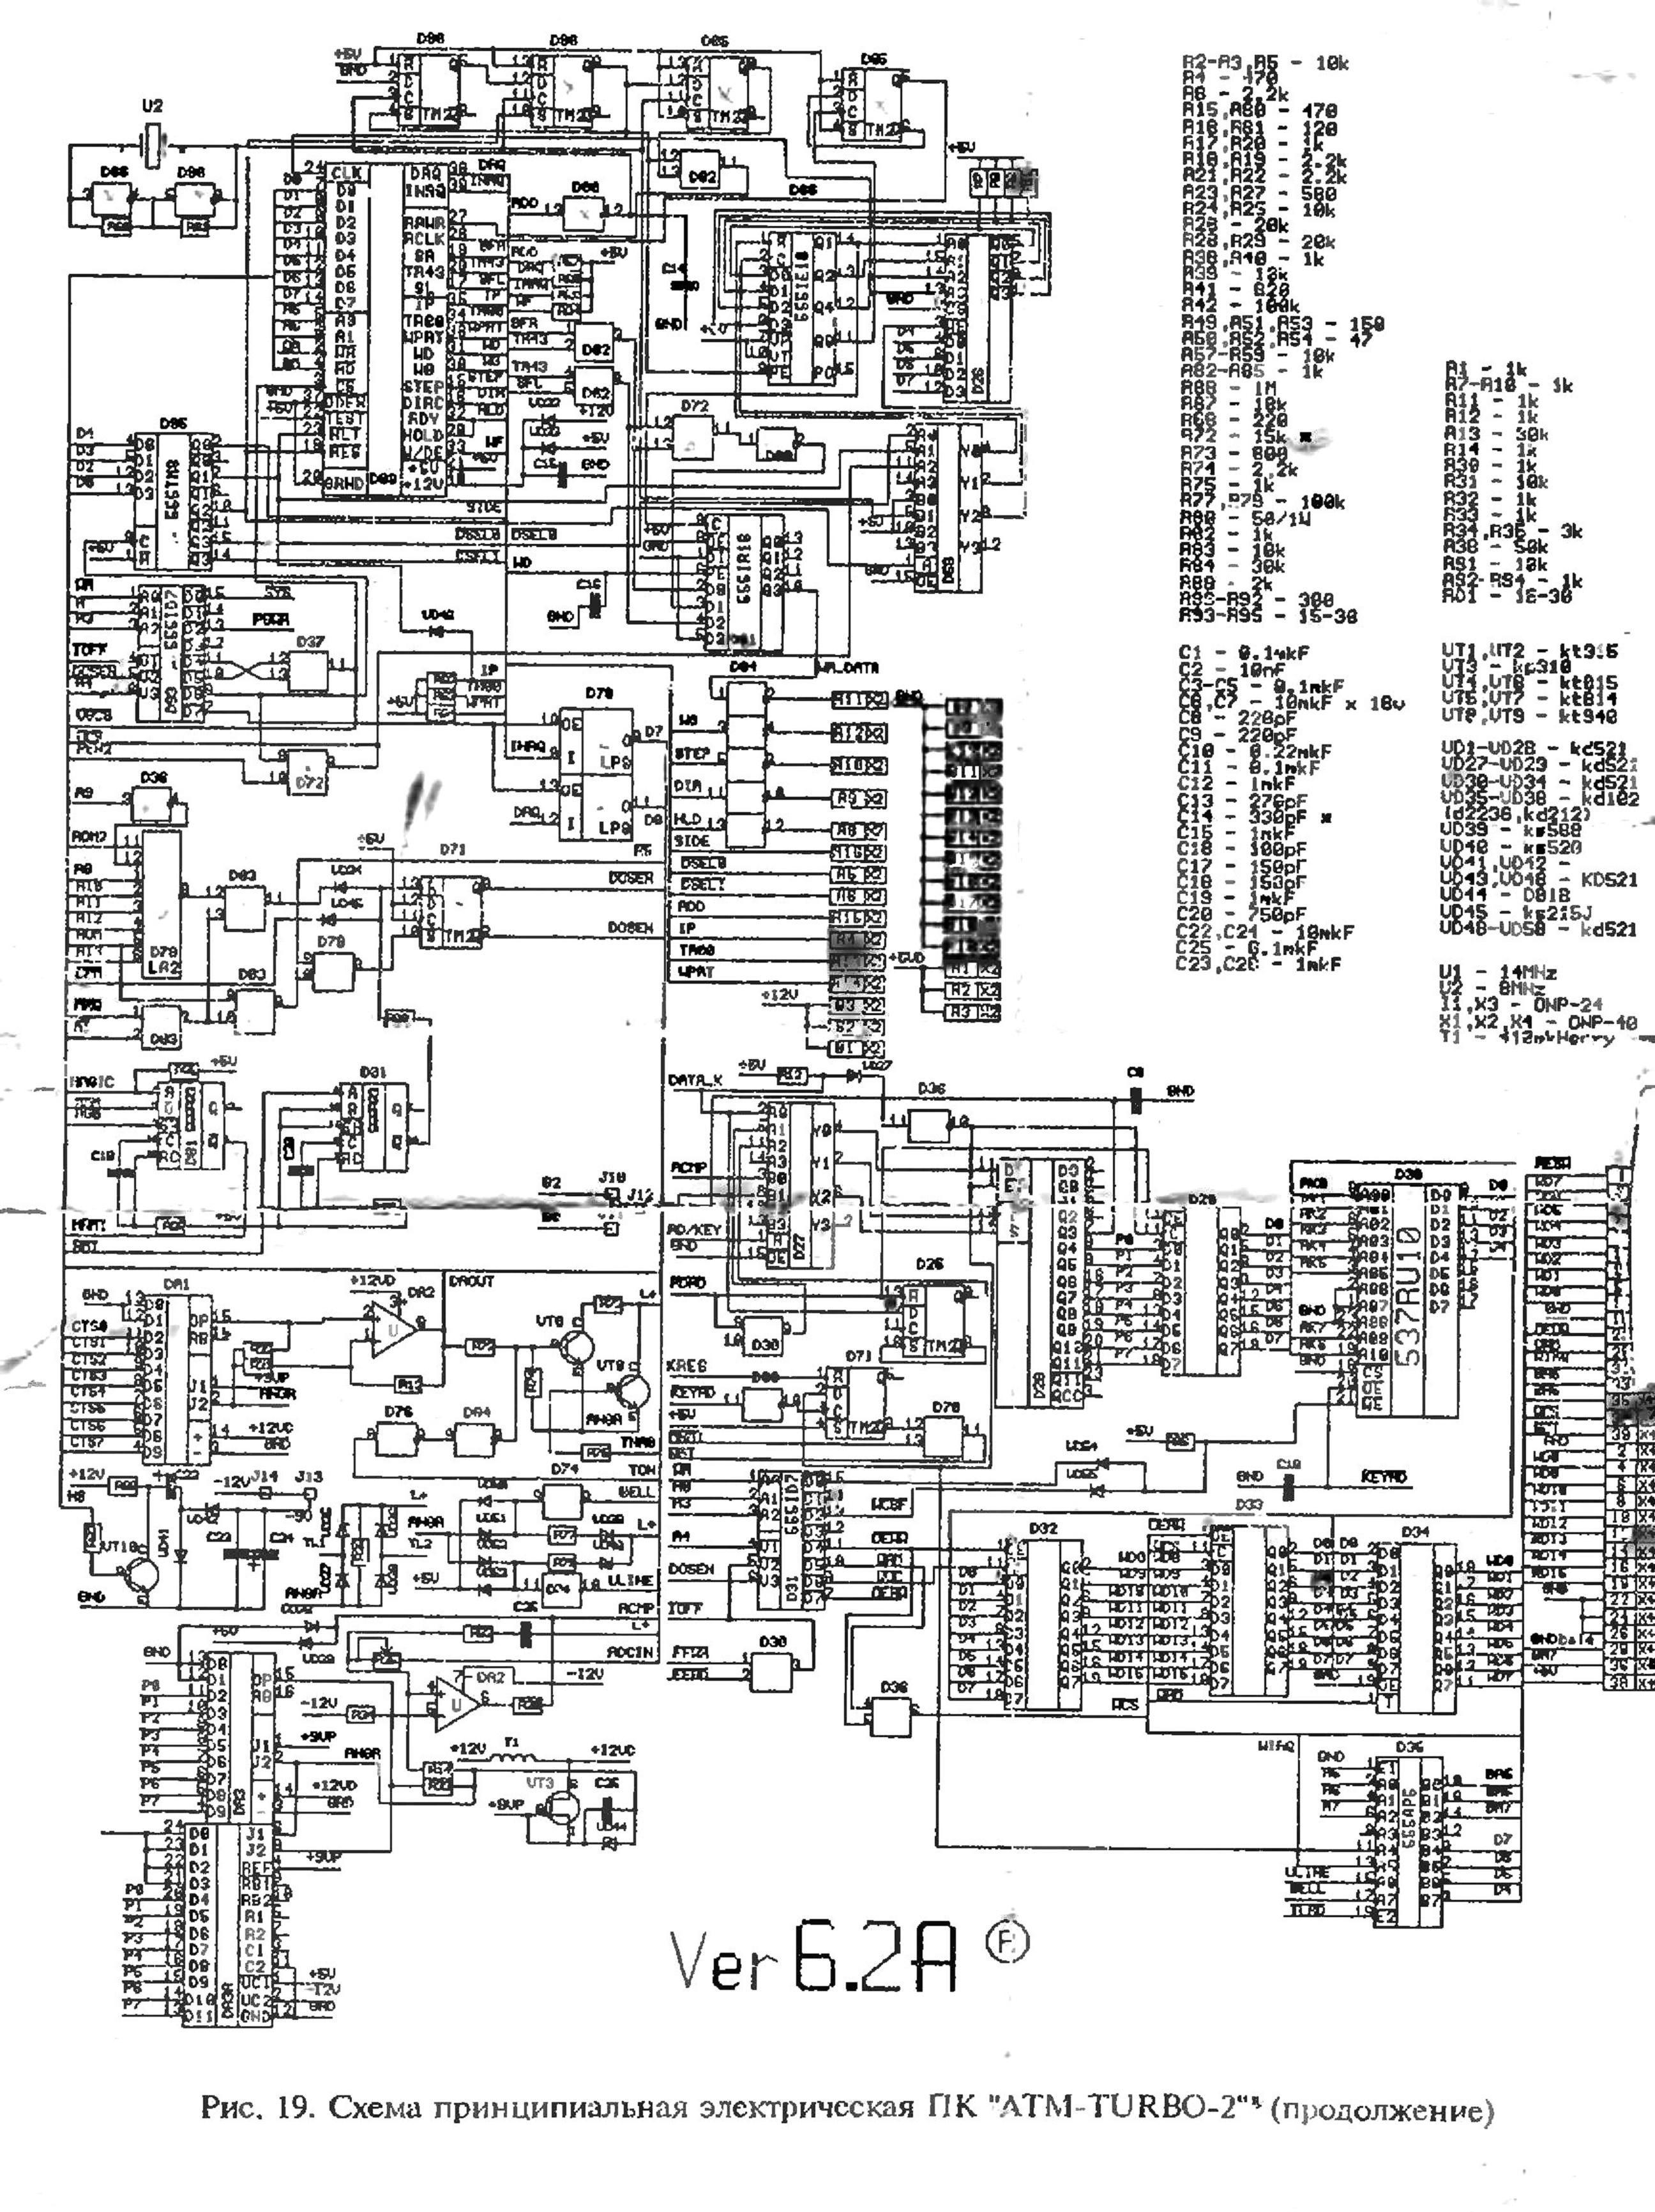 Diagram Of A Turbo atm Diagram Best Context Diagram Example Newest Fluid Mechanics Of Diagram Of A Turbo